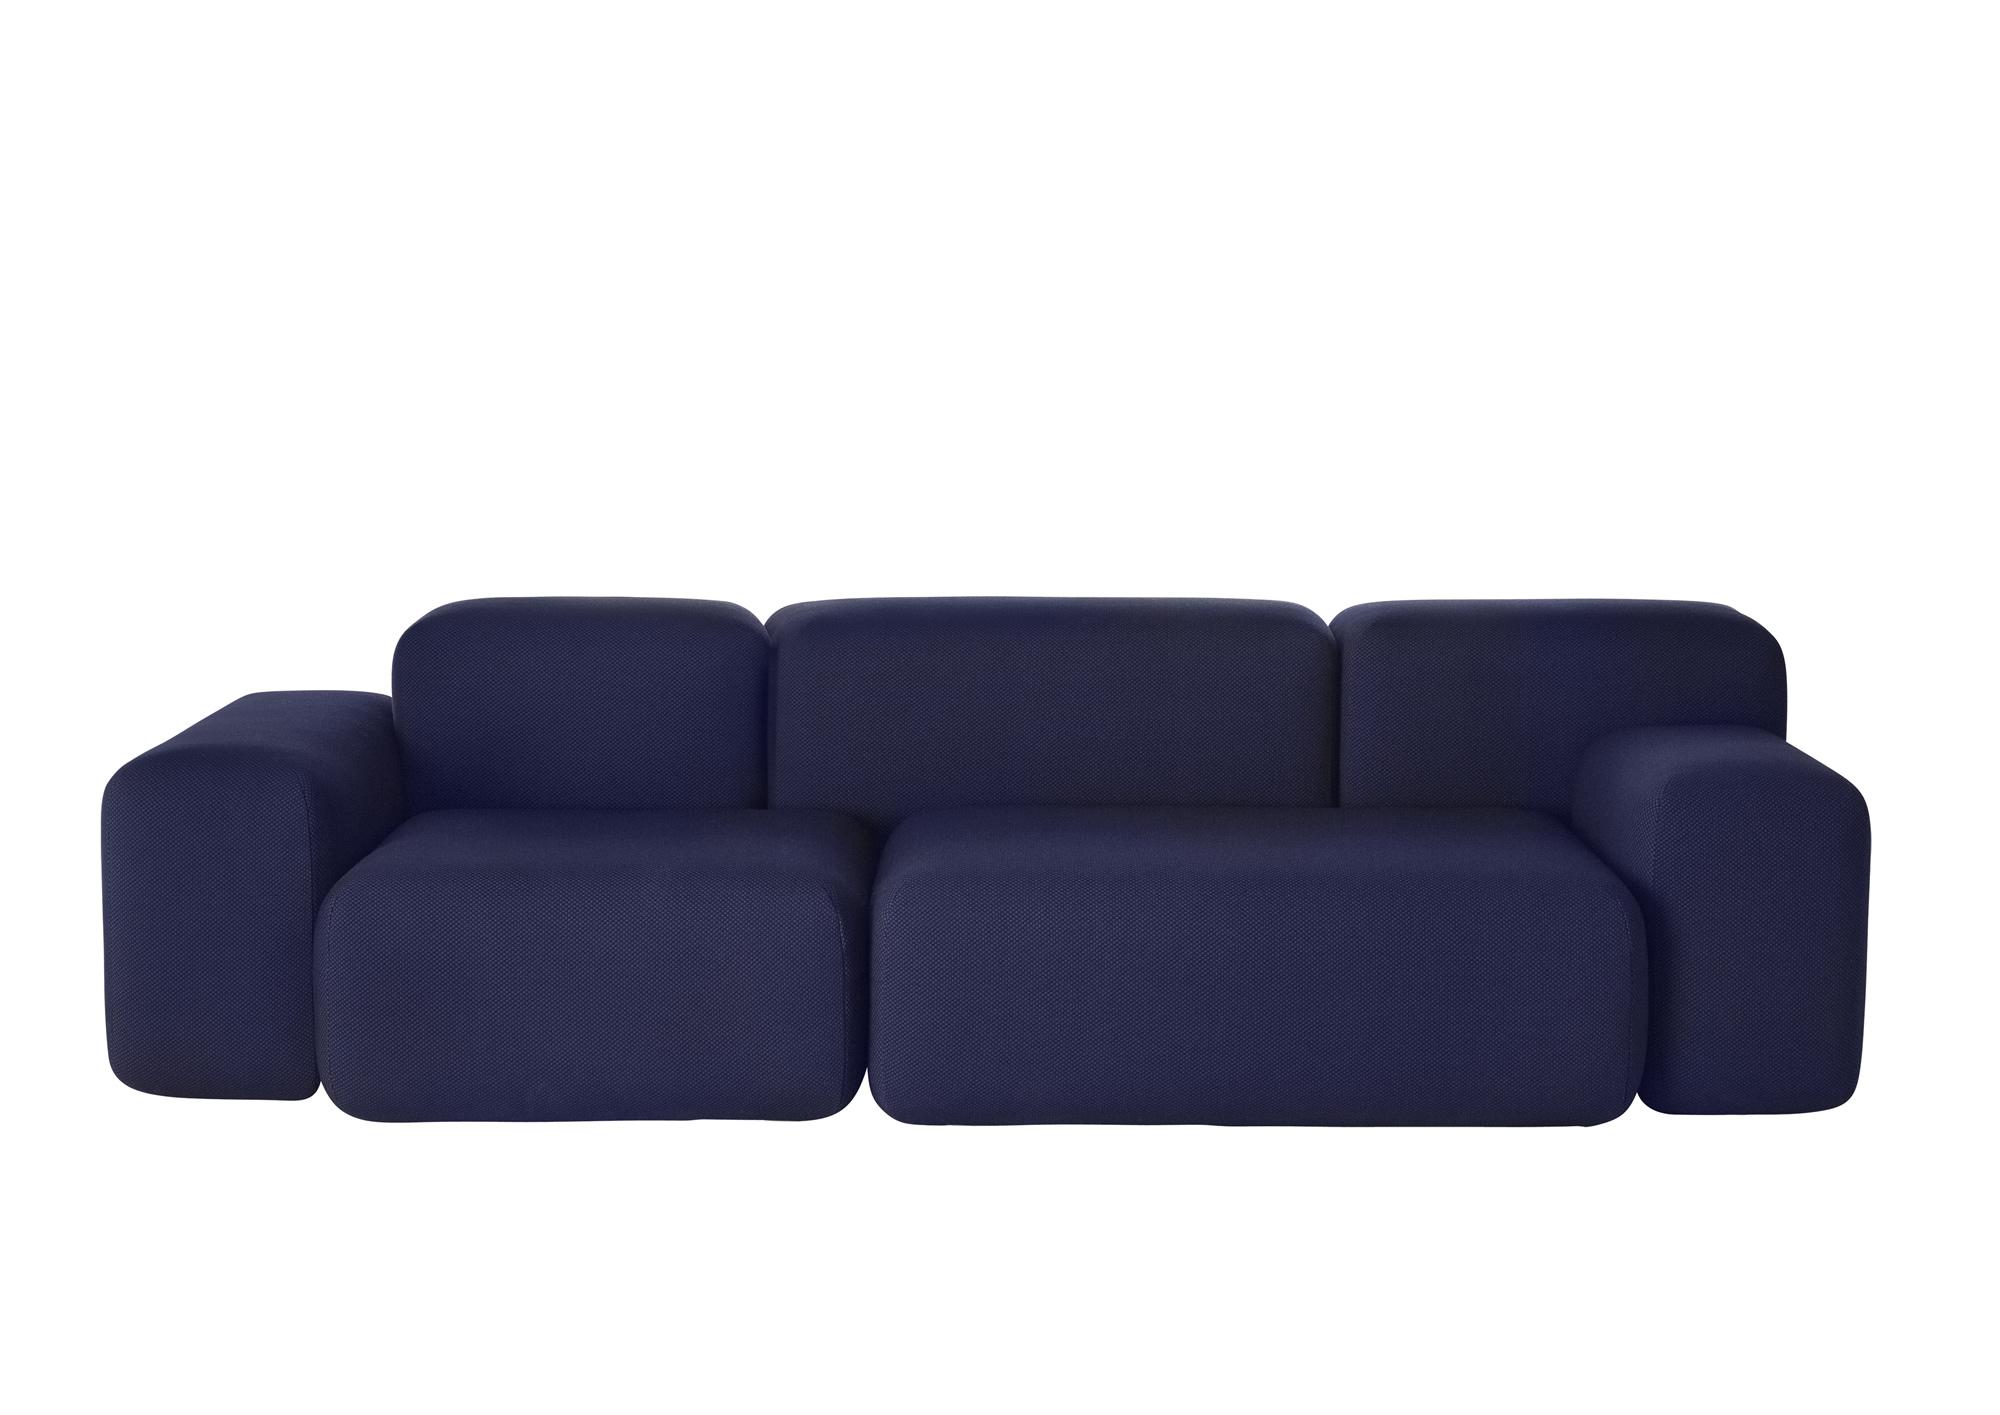 Soft Blocks Sofa by Petter Skogstad for MUUTO